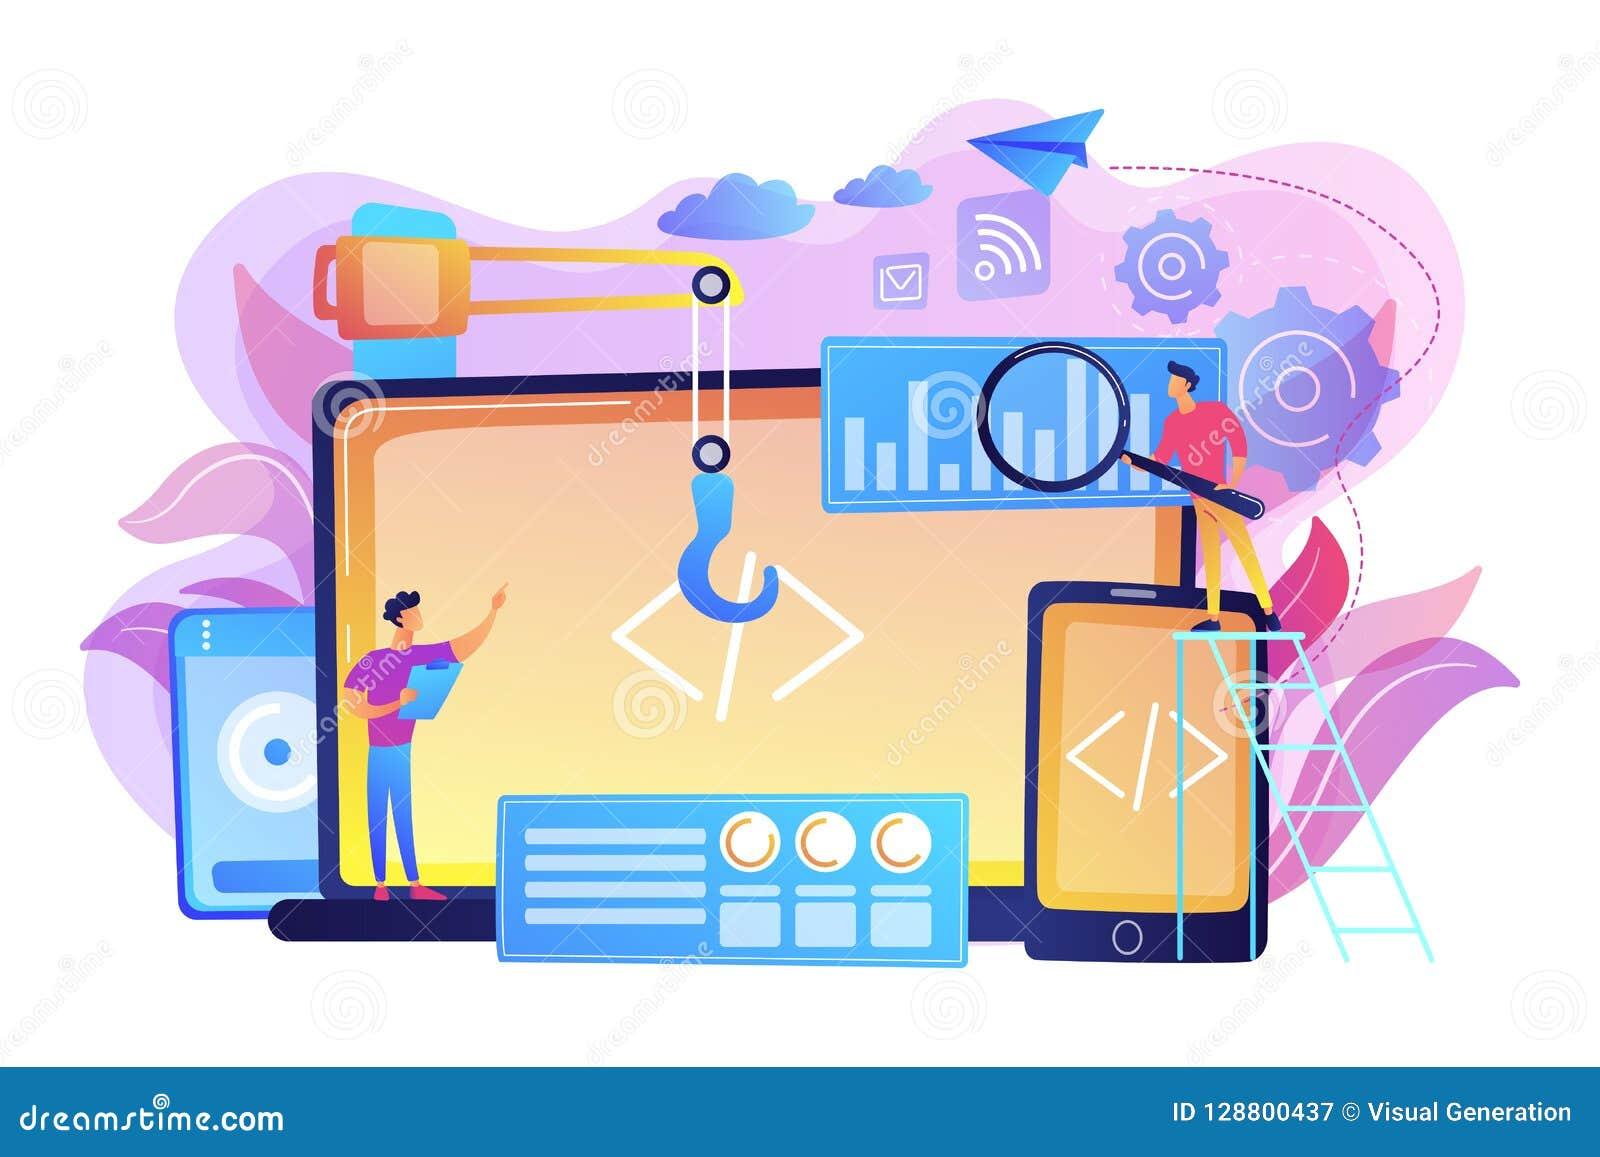 Cross-platform Development Concept Vector Illustration  Stock Vector